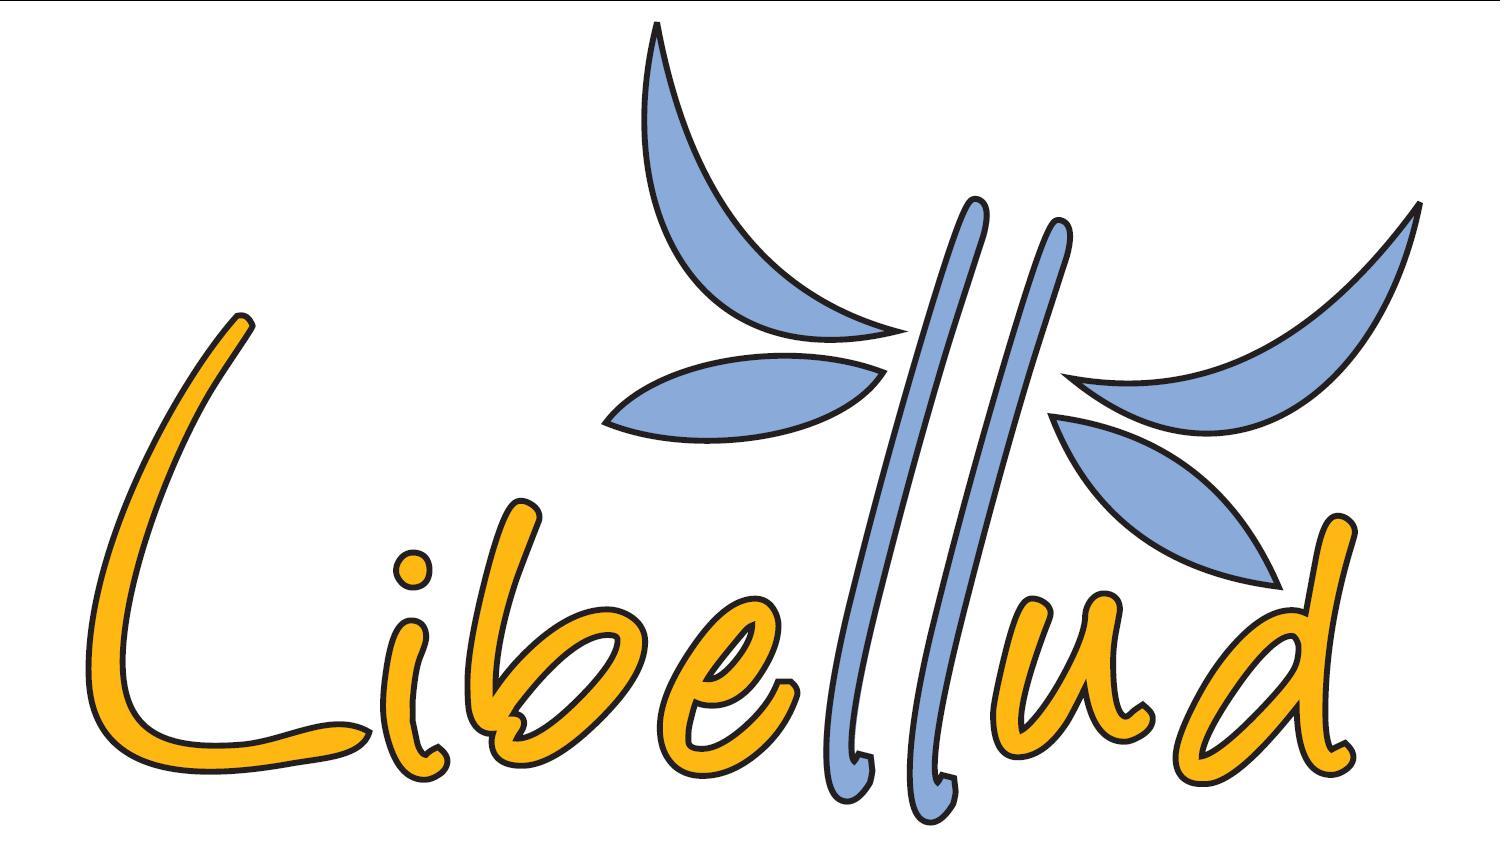 Libellud, Libellud игра, Libellud купить